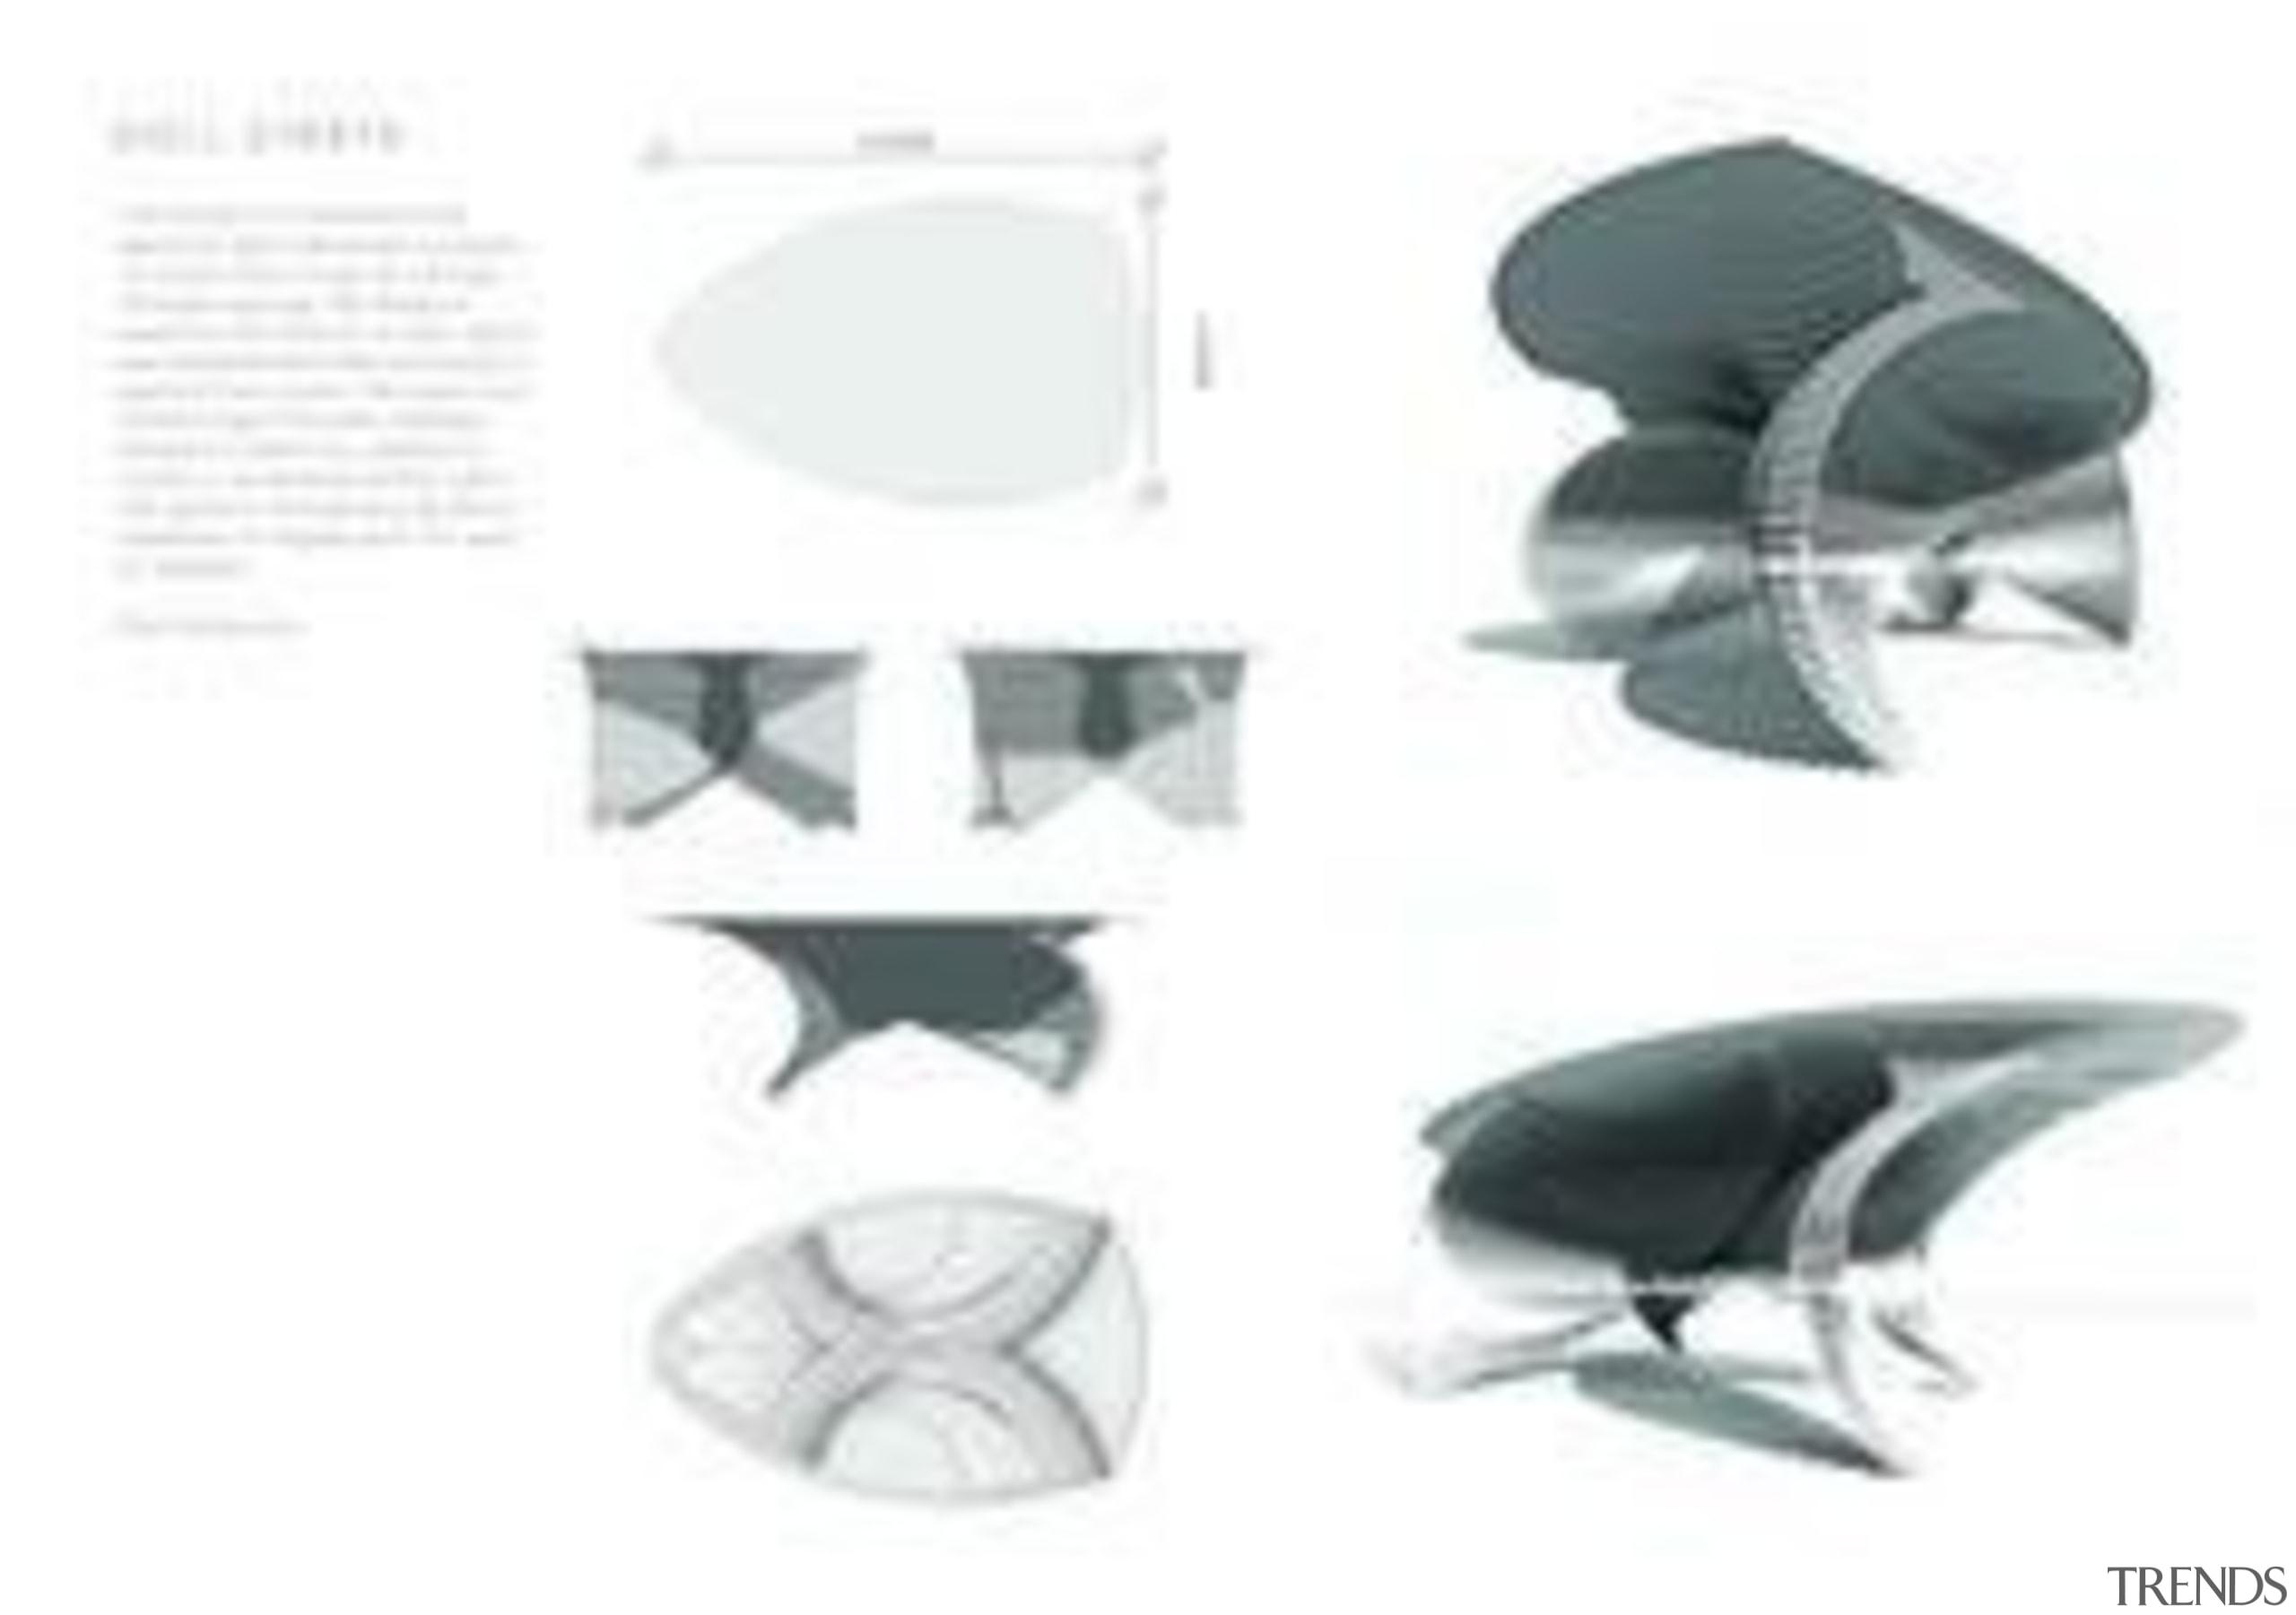 225bfa4f12e4baa987380b457551dc21.jpg - 225bfa4f12e4baa987380b457551dc21.jpg - design | font | design, font, furniture, plastic, product, product design, white